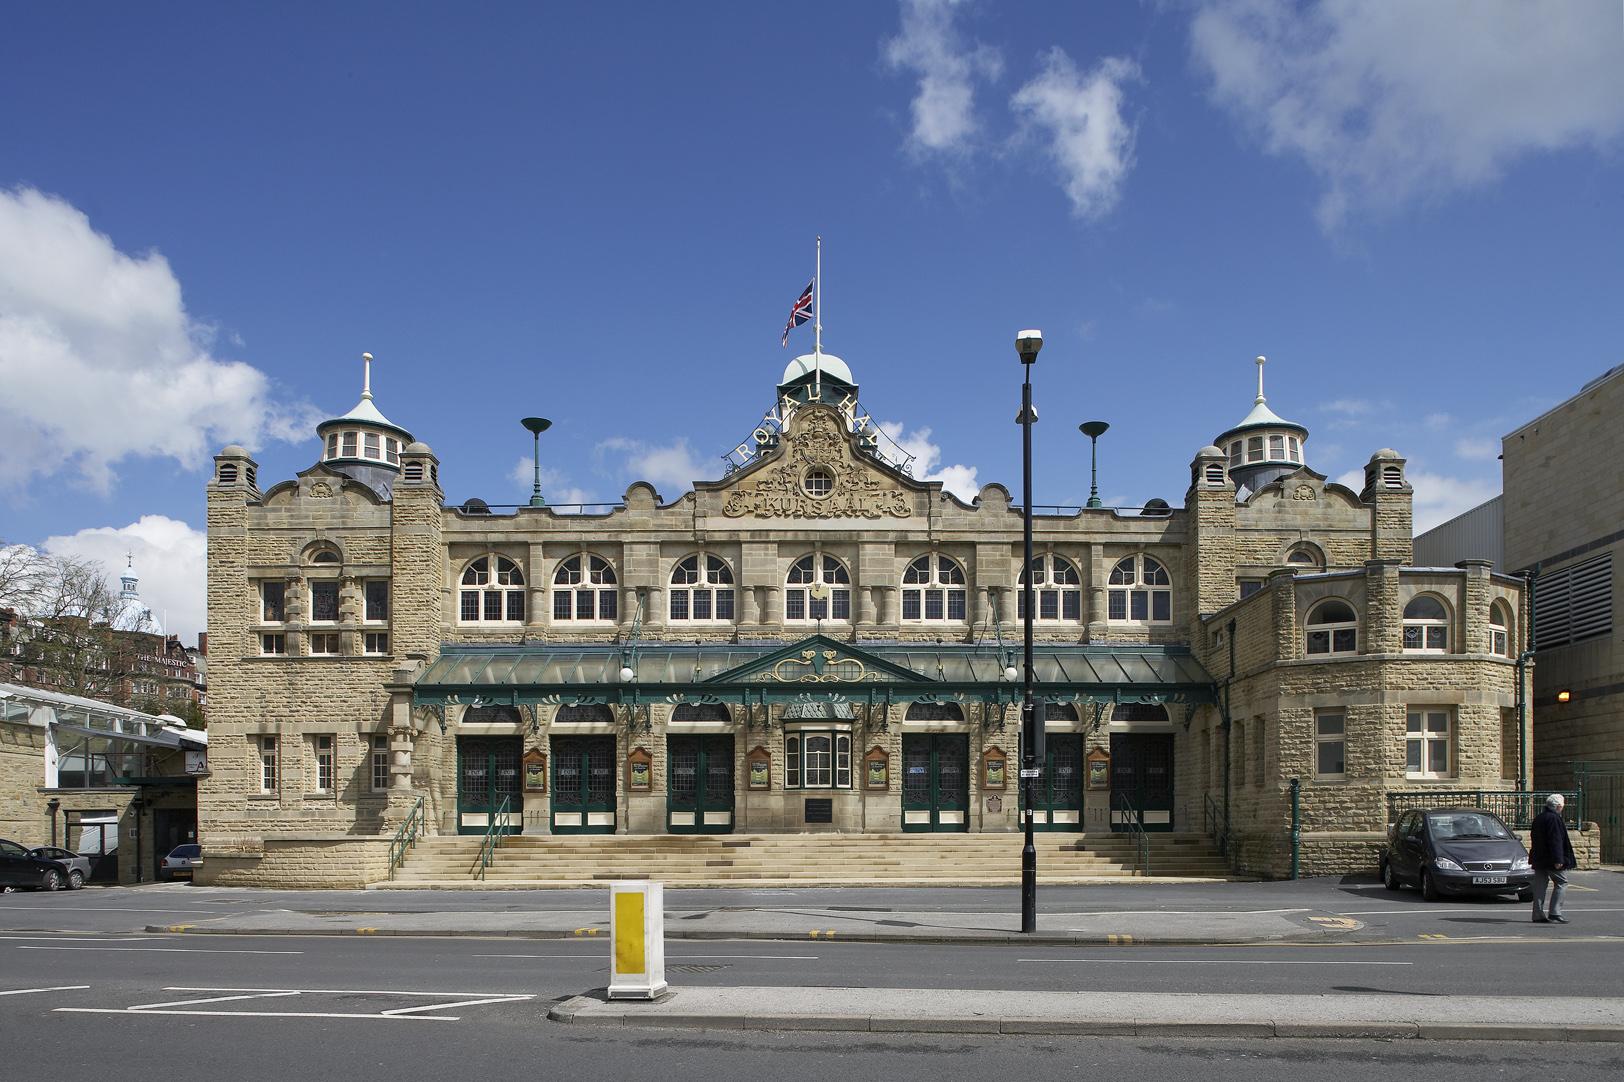 Royal Hall, Harrogate